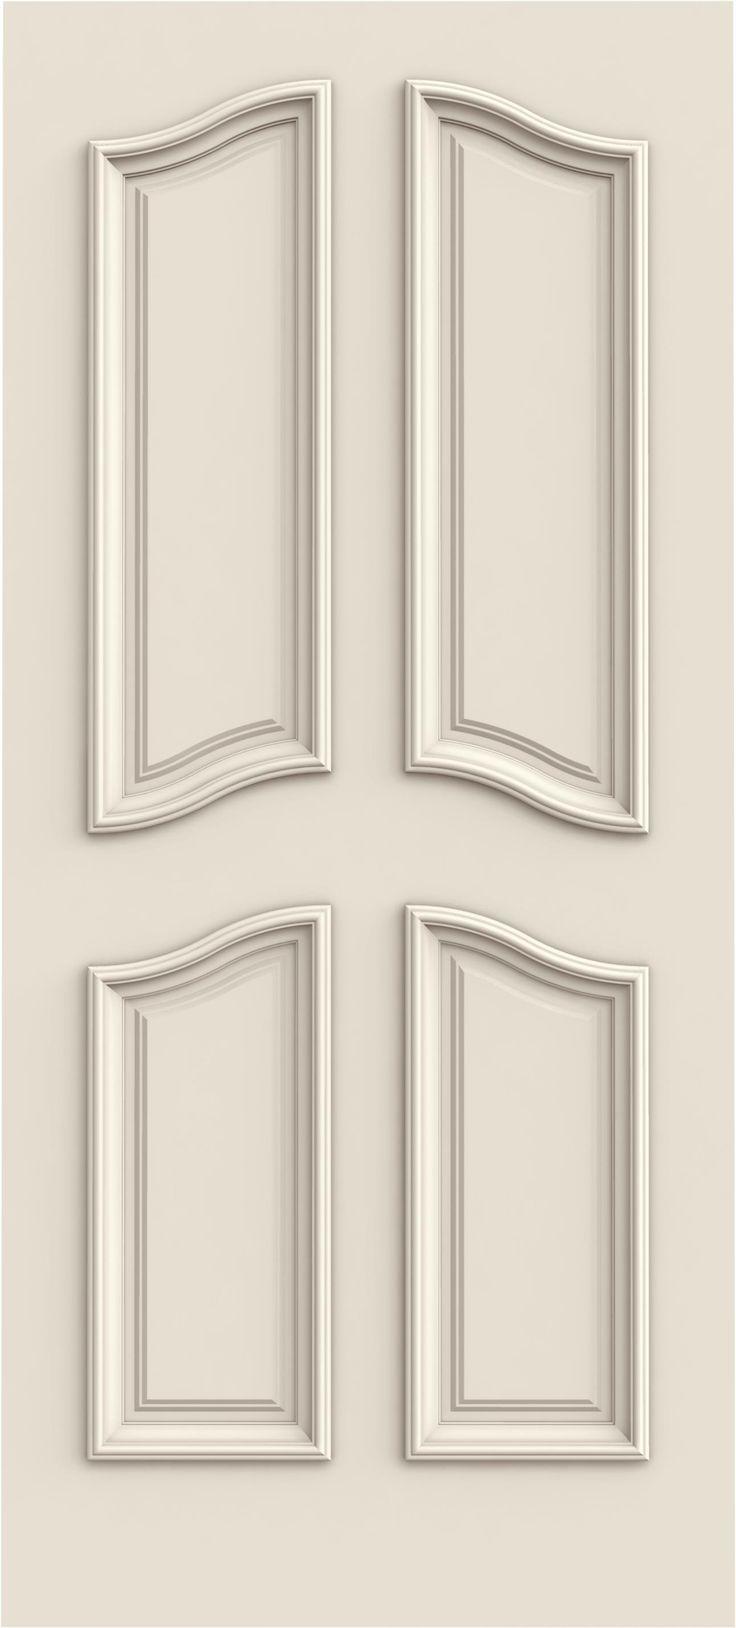 13 Best Exterior Home Design Images On Pinterest